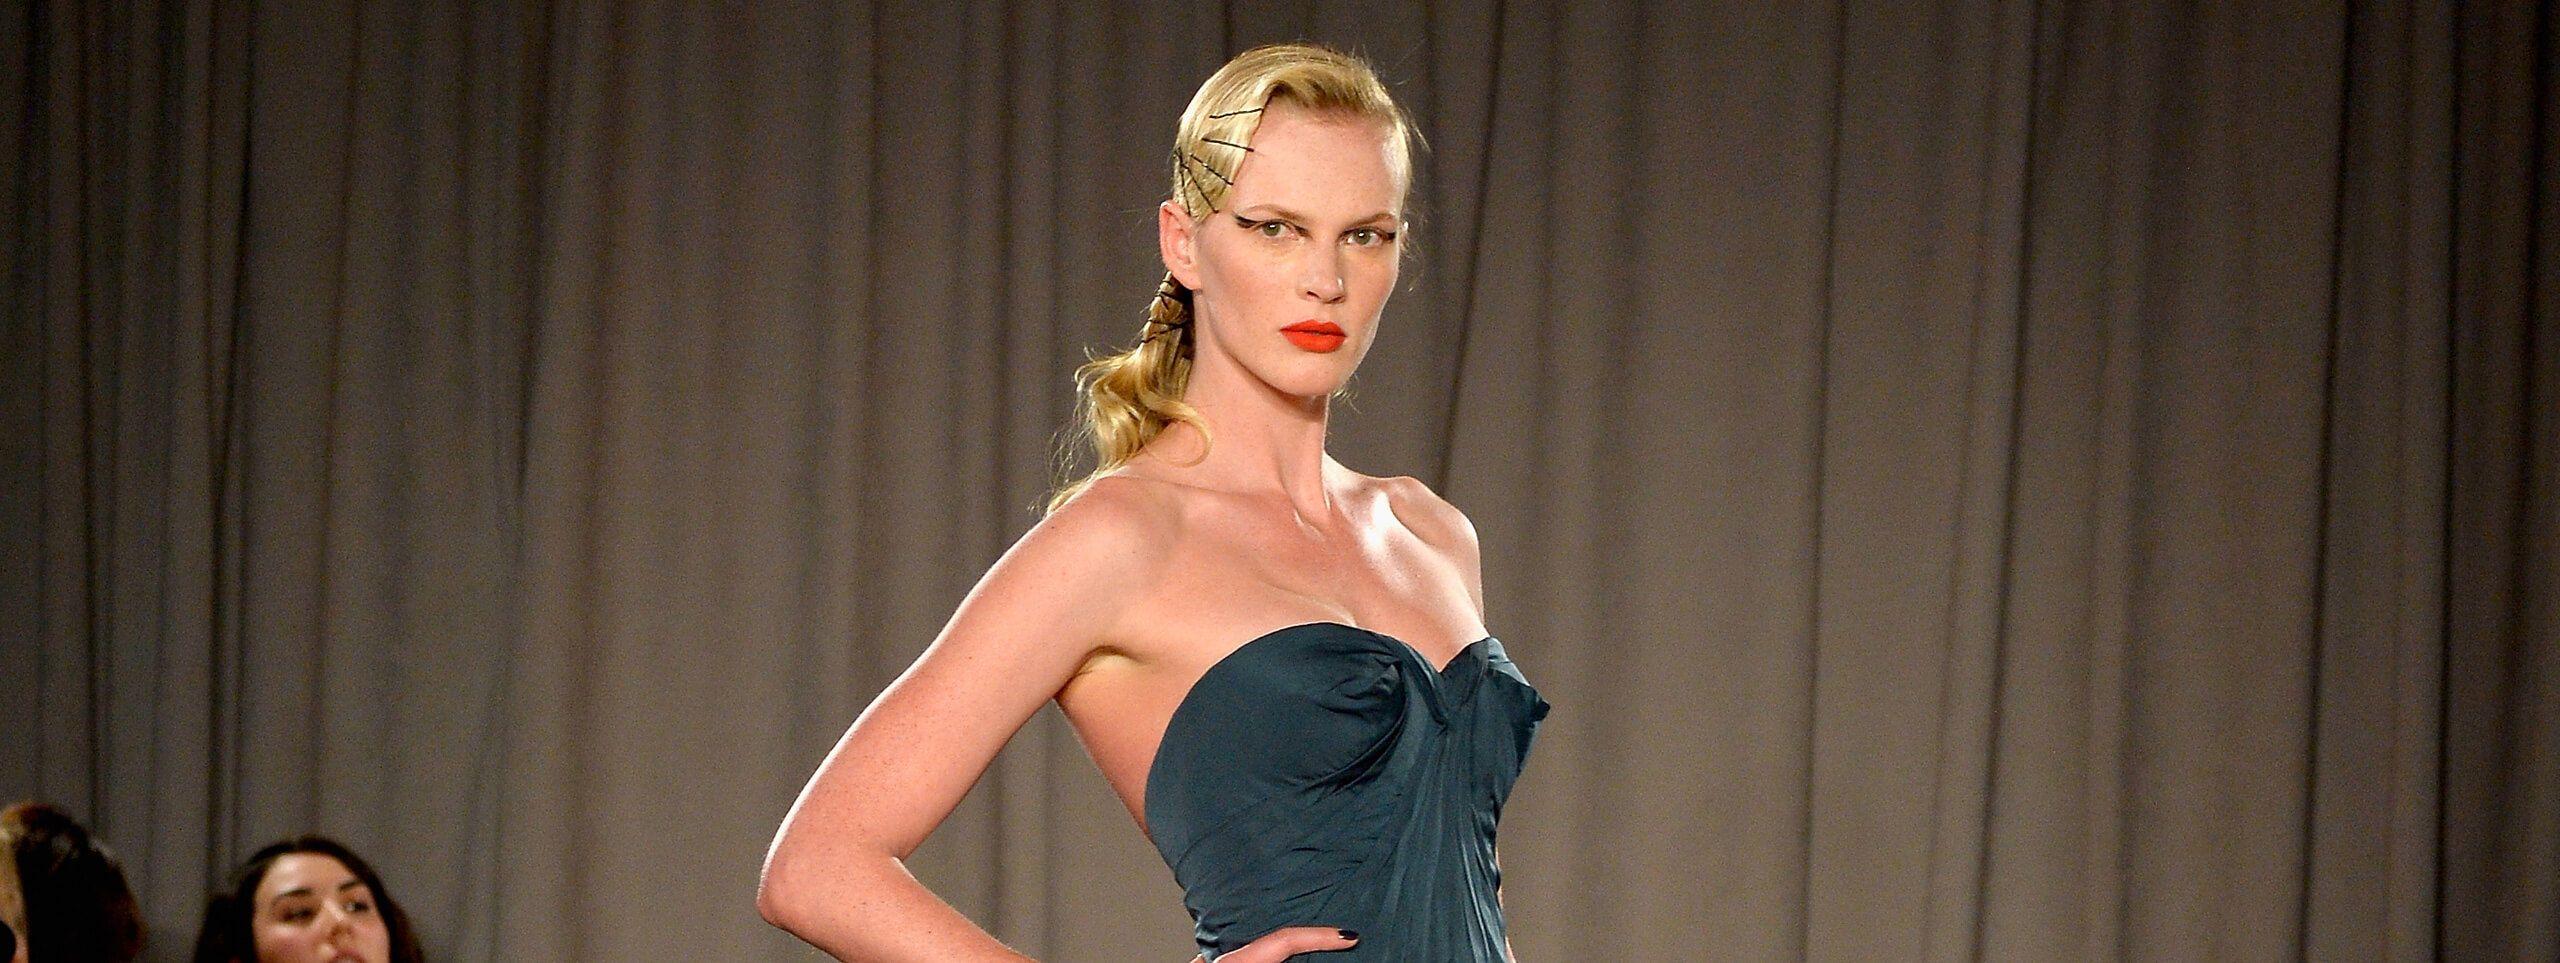 Modelka z fryzurą ze wsuwkami